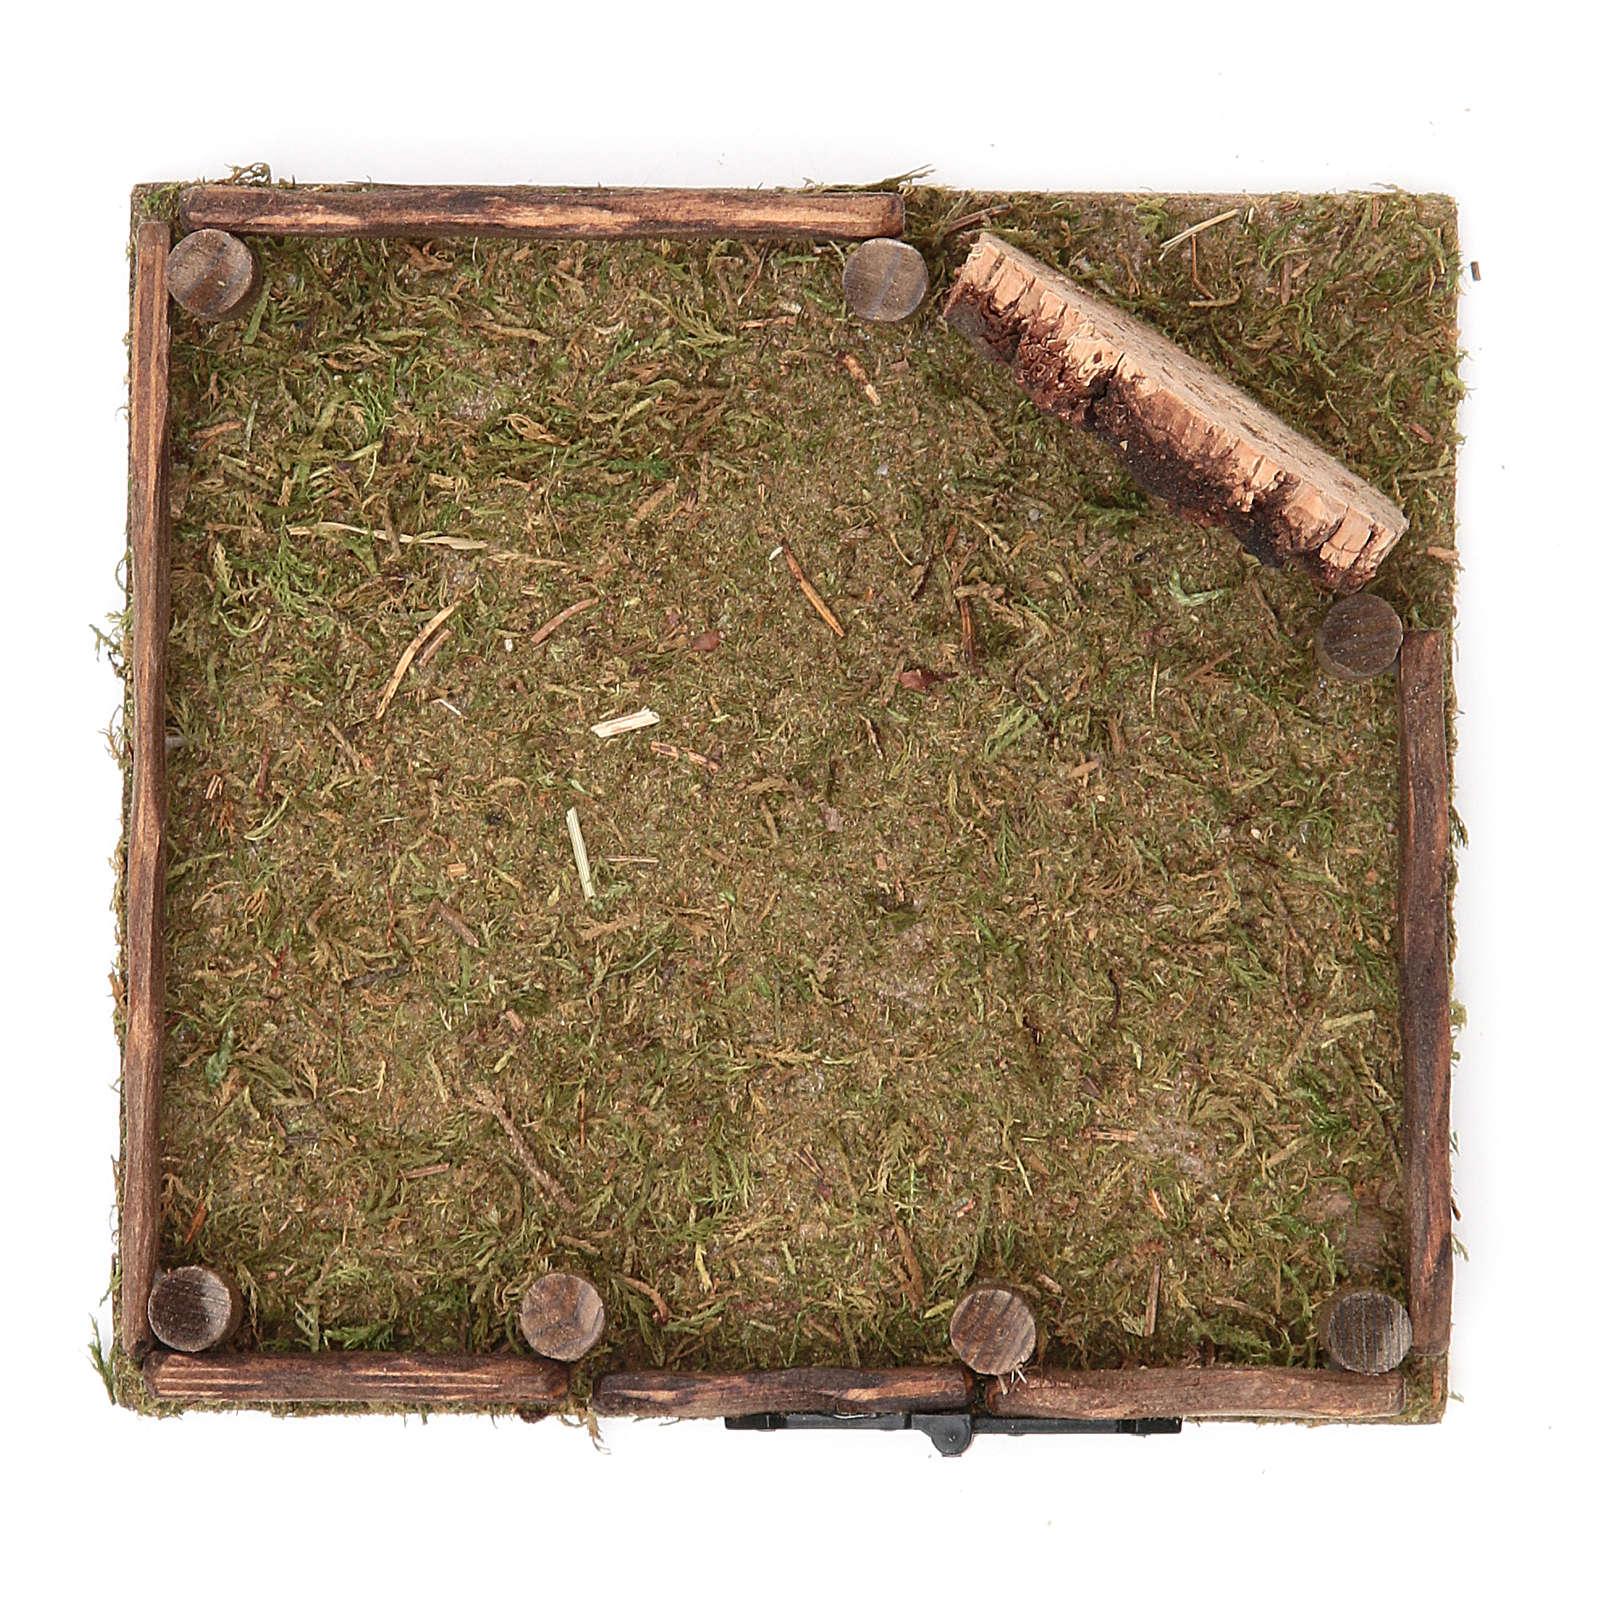 Corral de madera belén 12x12 cm 4